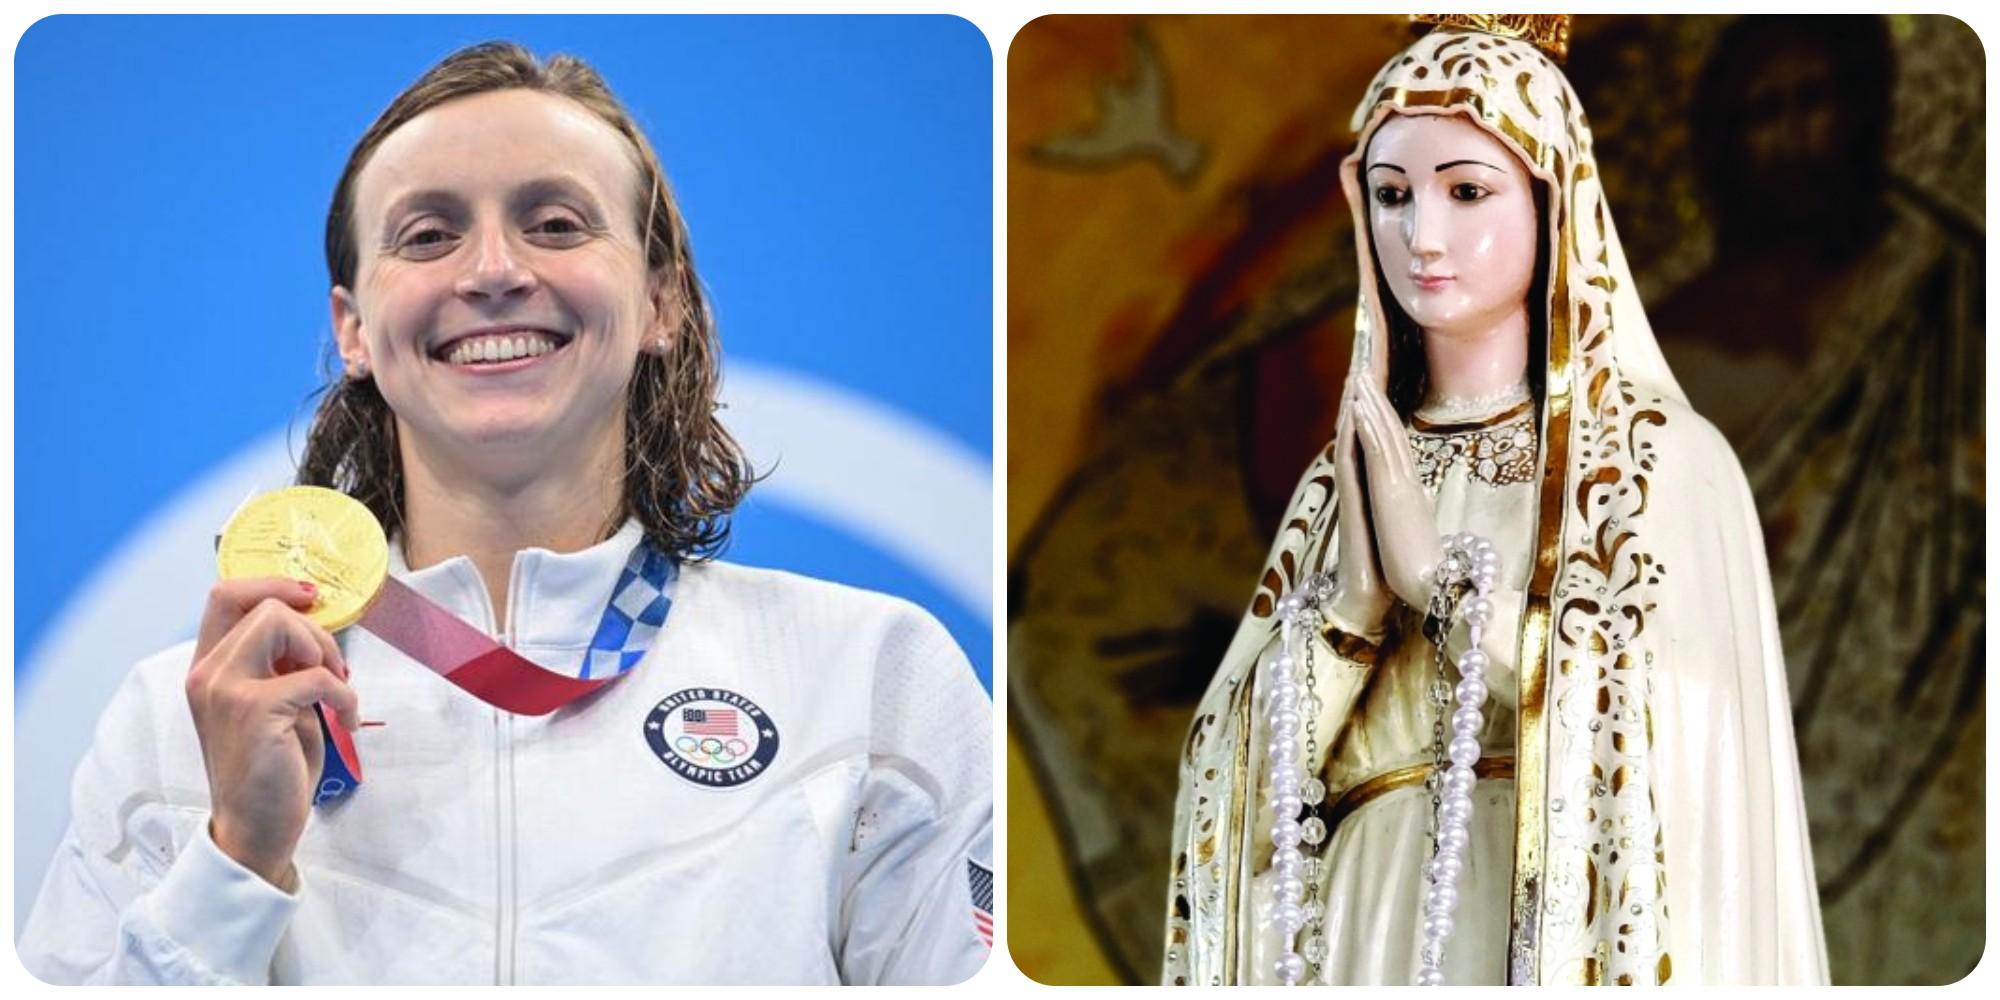 Katie Ledecky, Juara Dunia Renang yang Suka Doa Salam Maria Sebelum Lomba